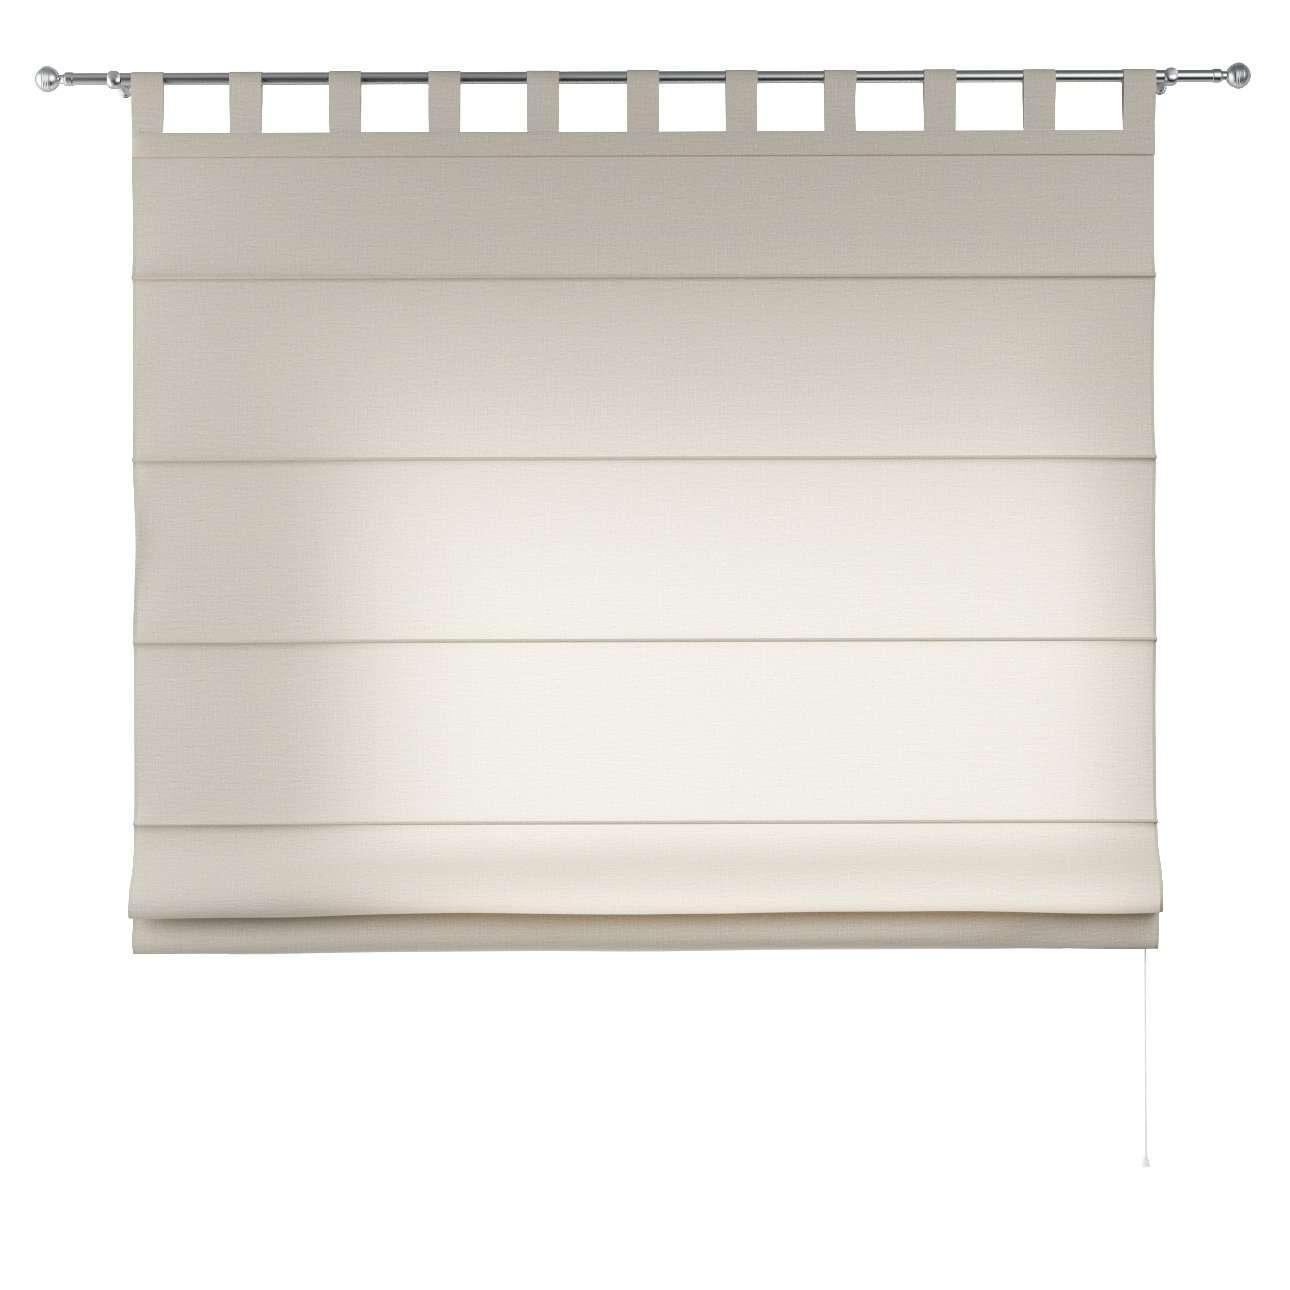 Foldegardin Verona<br/>Med stropper til gardinstang 80 x 170 cm fra kollektionen Linen, Stof: 392-05